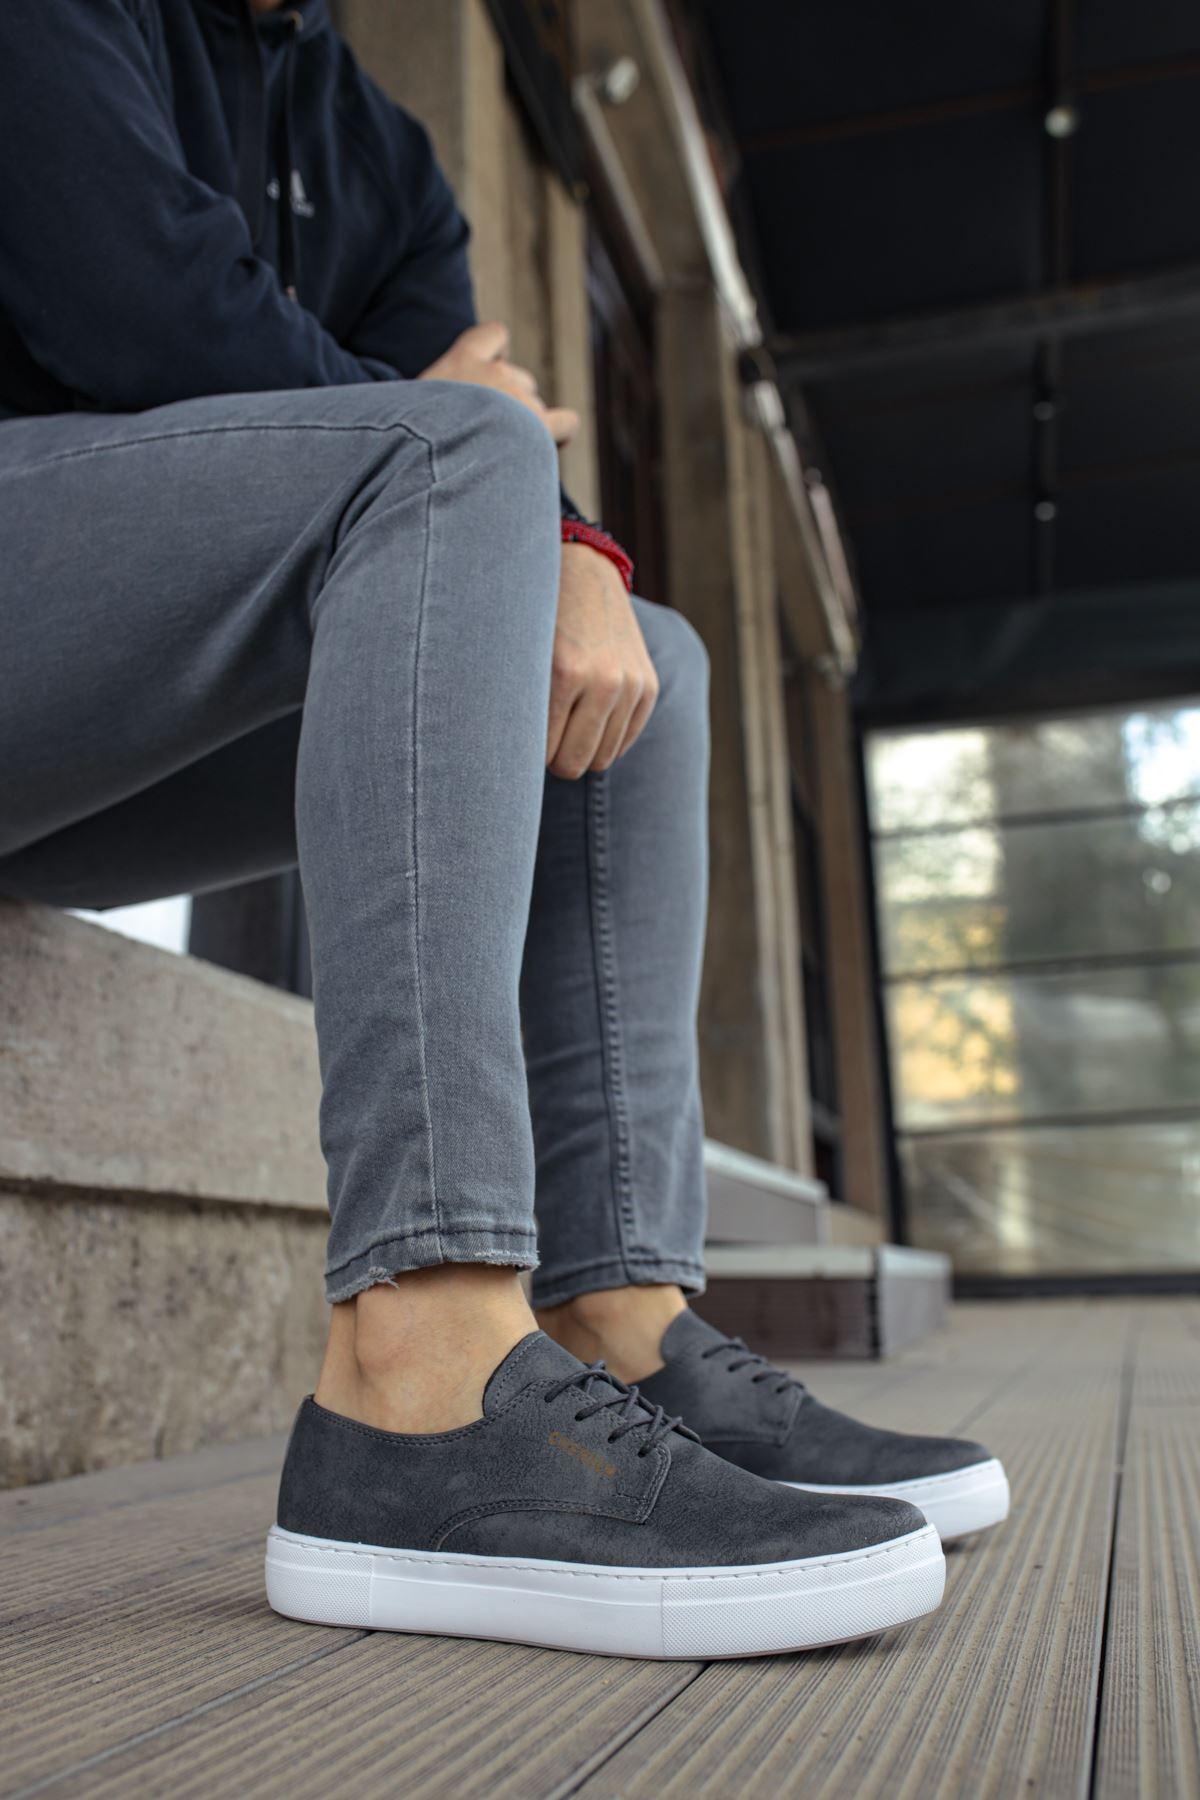 Chekich CH005 BT Erkek Ayakkabı ANTRASIT